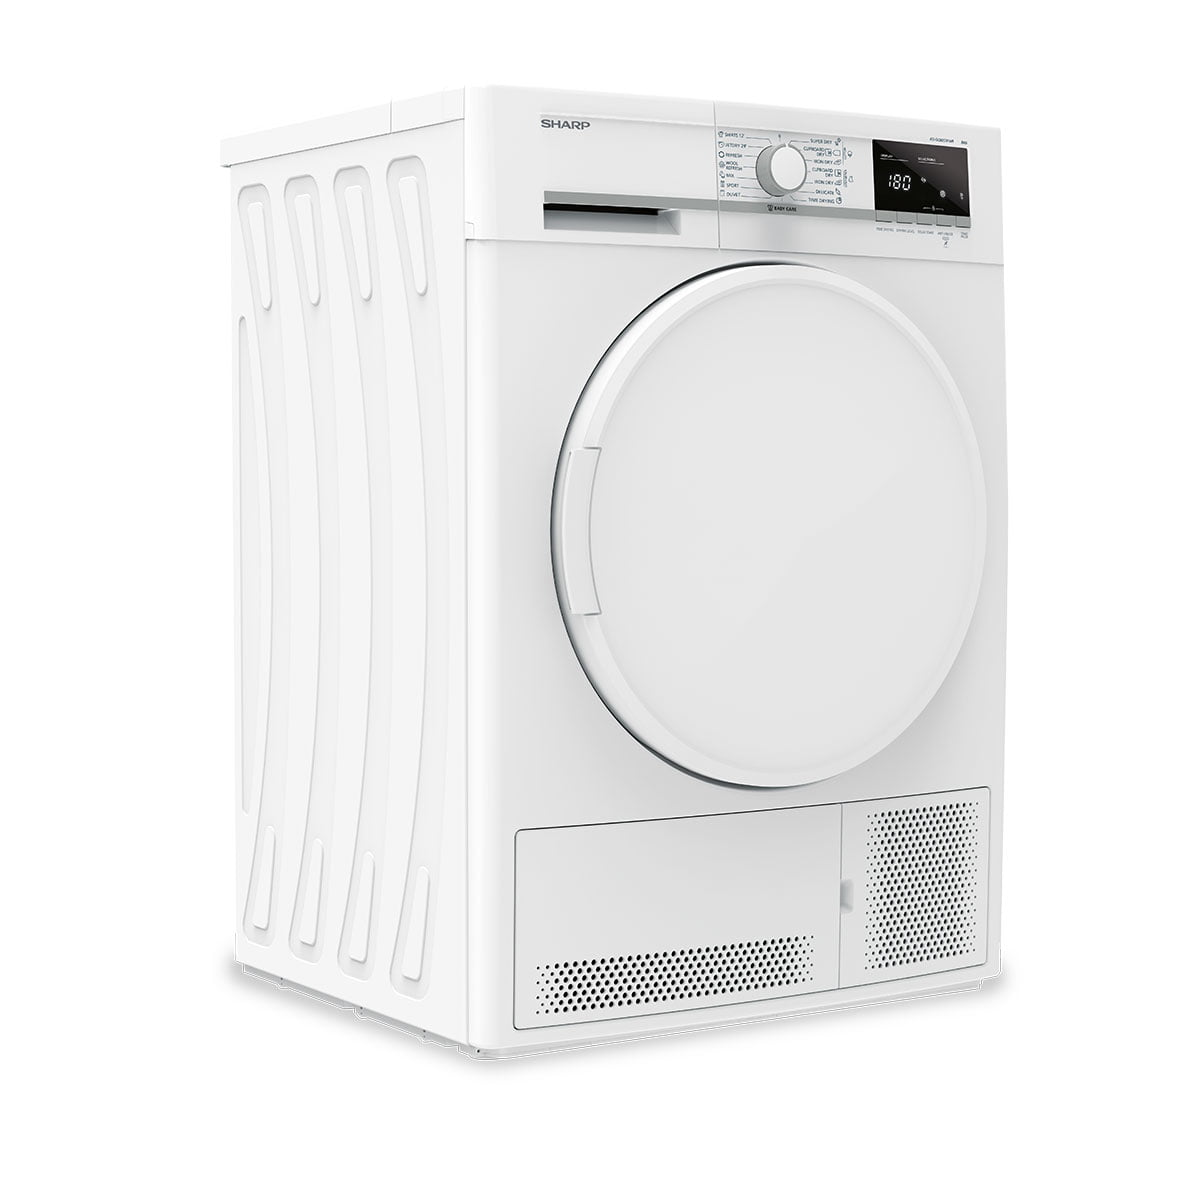 Mašina za sušenje veša 7kg – SHARP KD-GCB7S7PW9